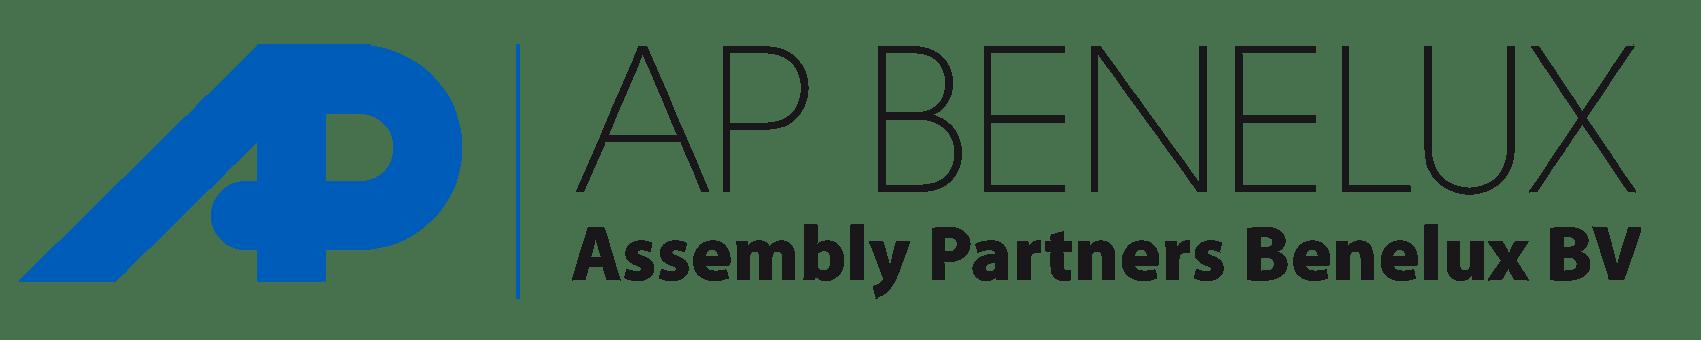 AP-Benelux Logo